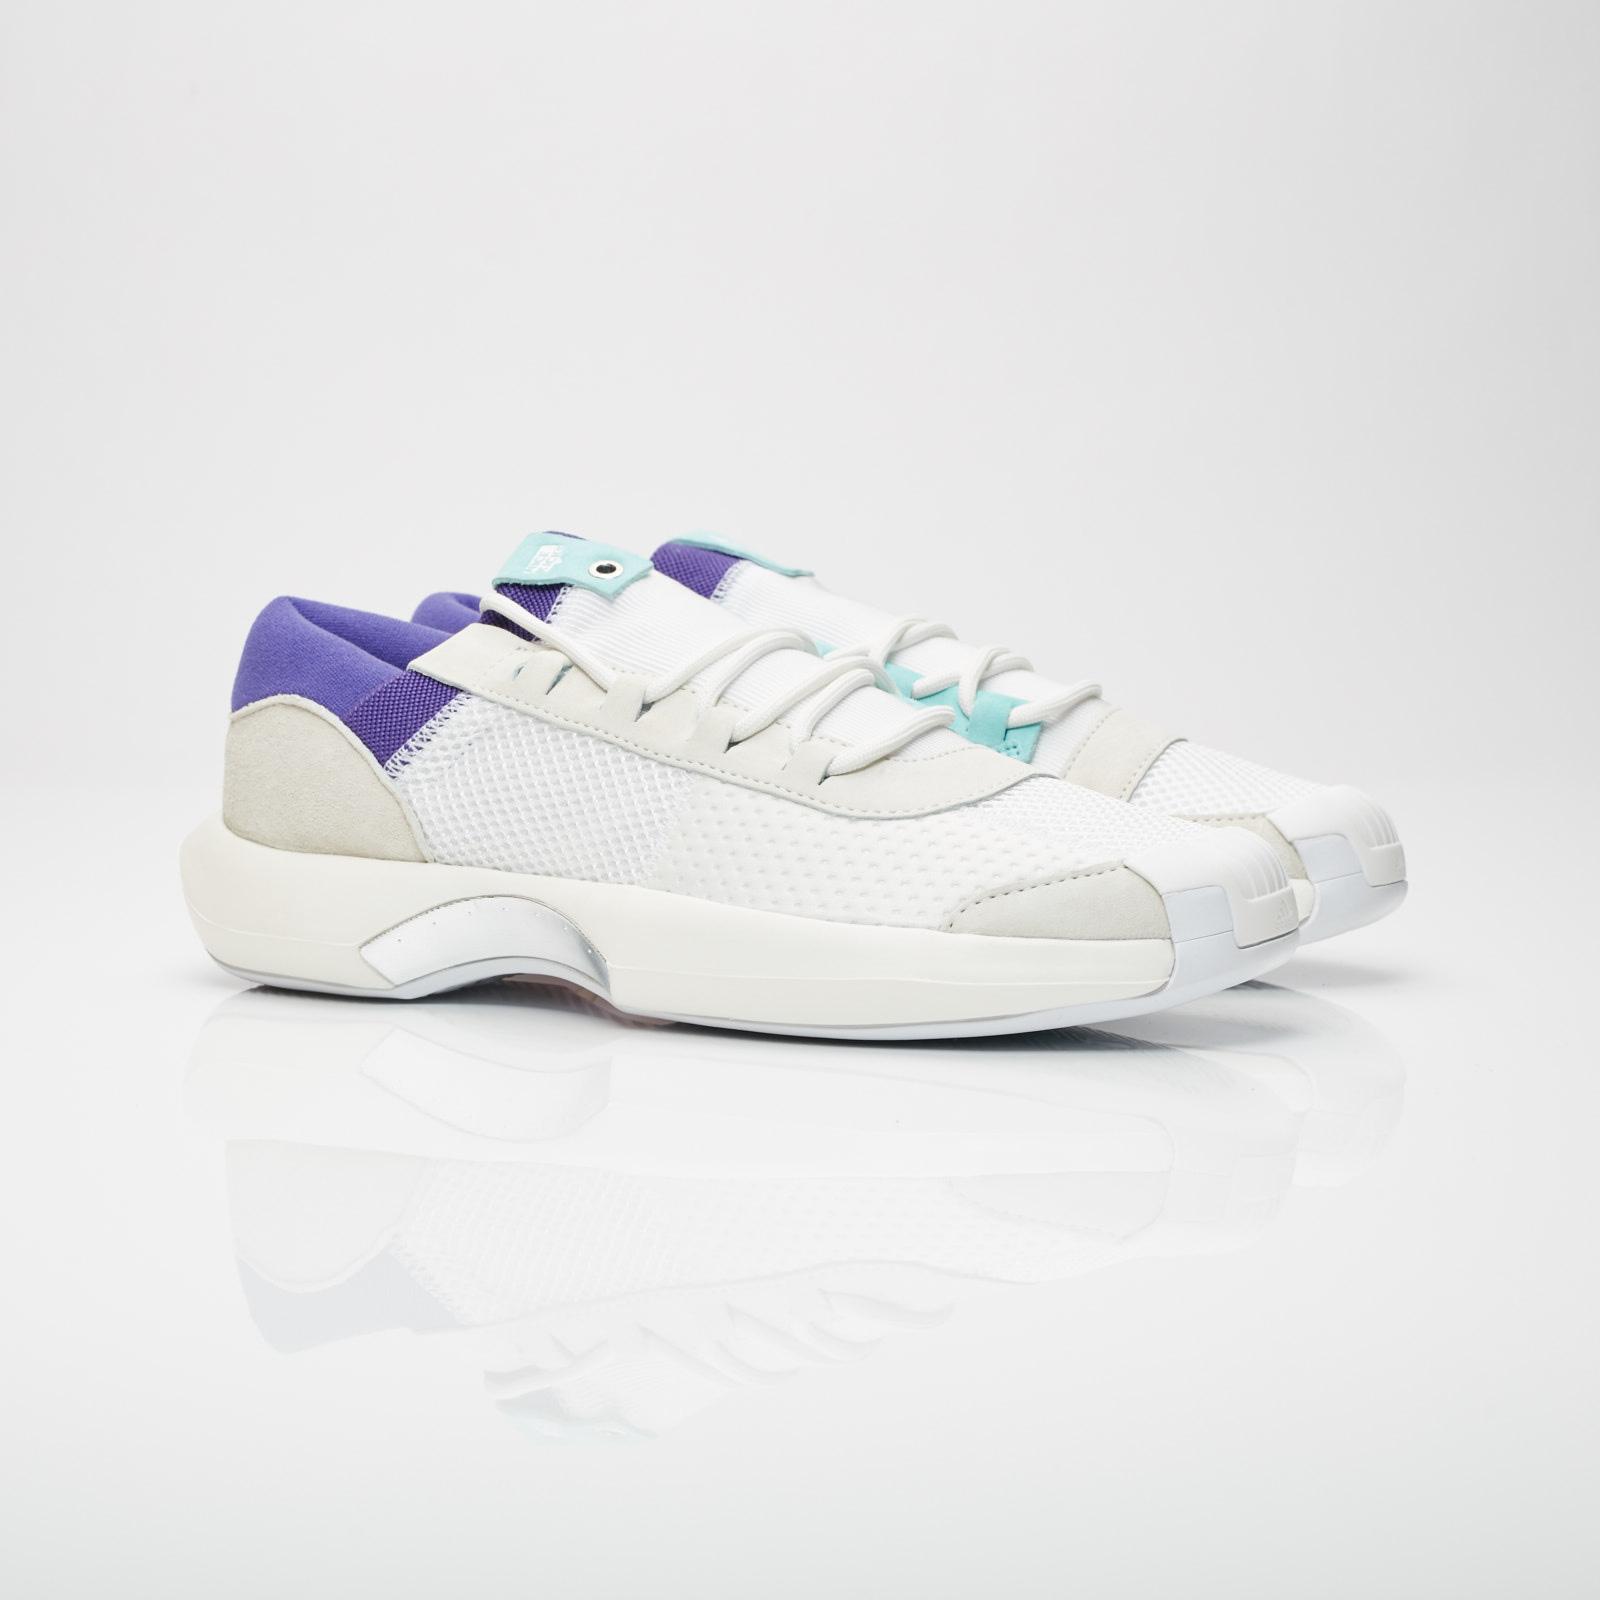 107716c64b6 adidas Crazy 1 x Nice Kicks - Db1786 - Sneakersnstuff